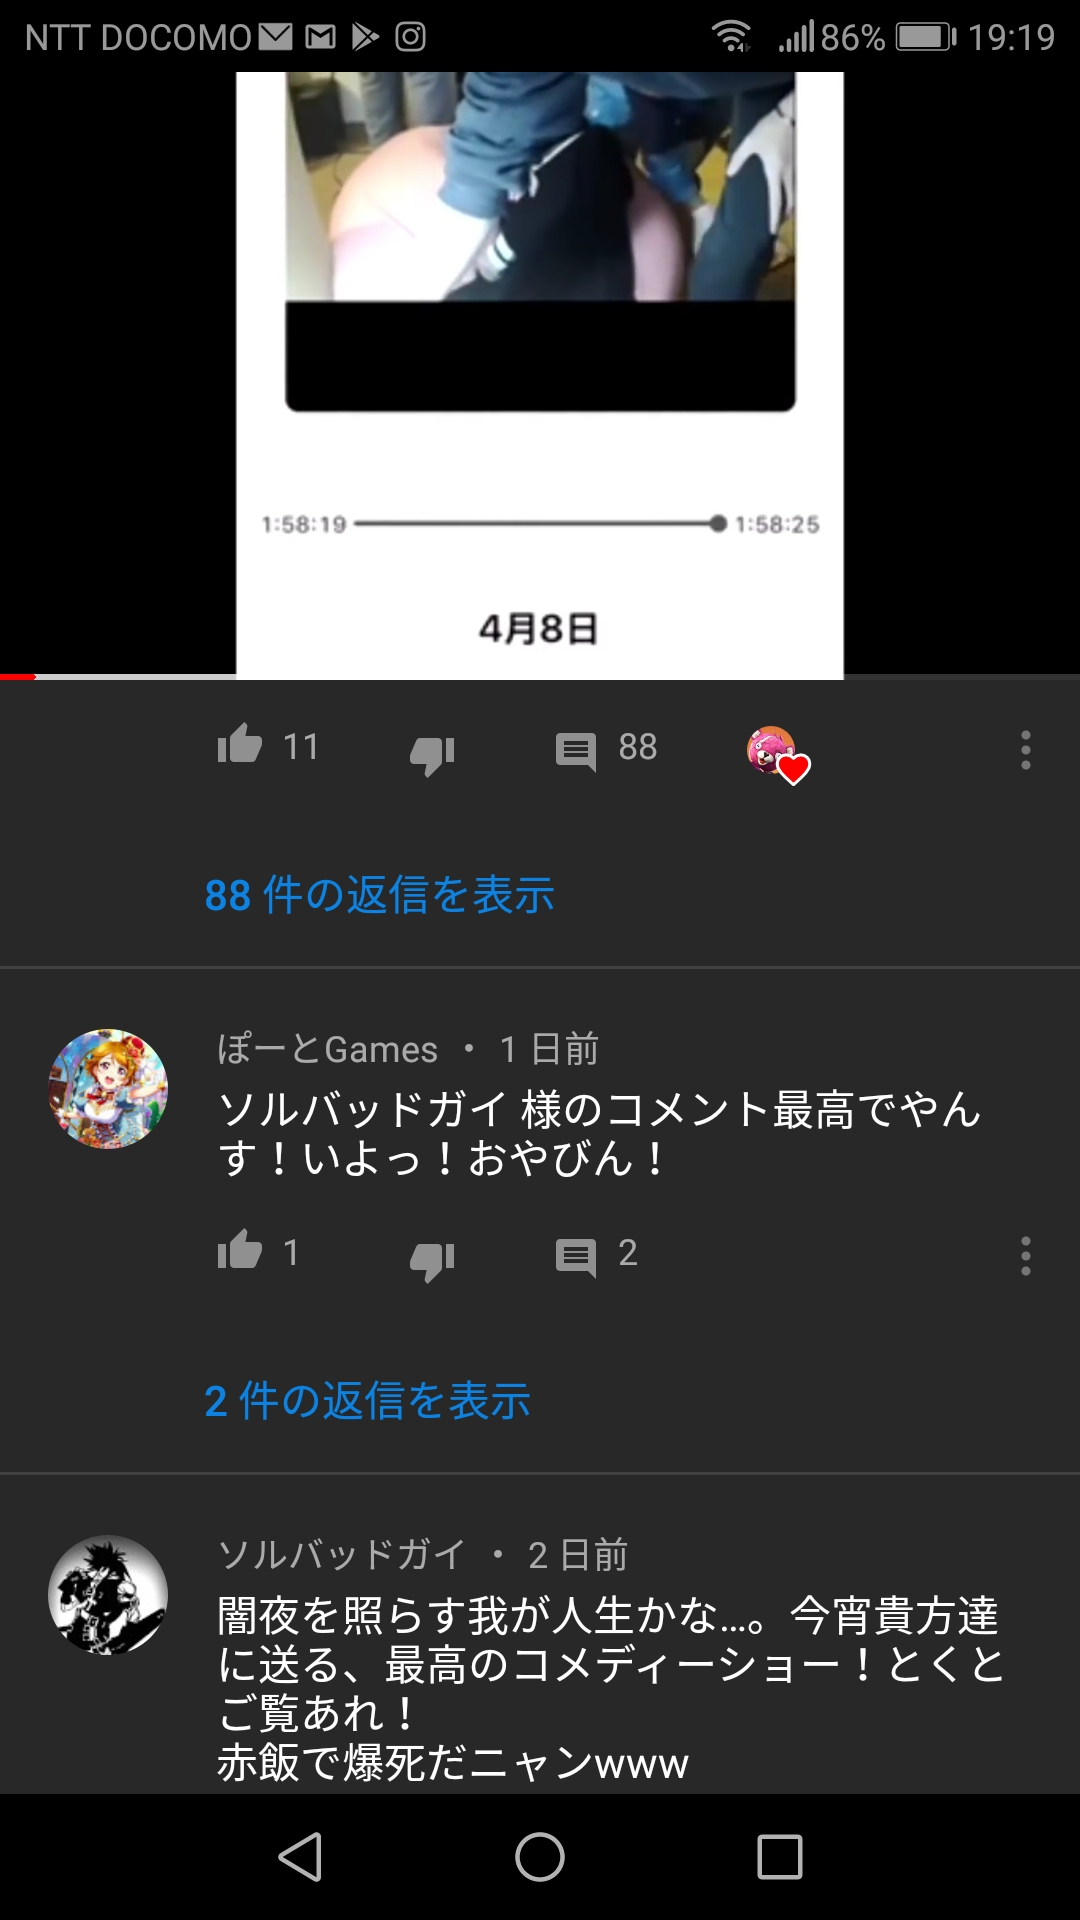 youtube アイコン 変える 方法